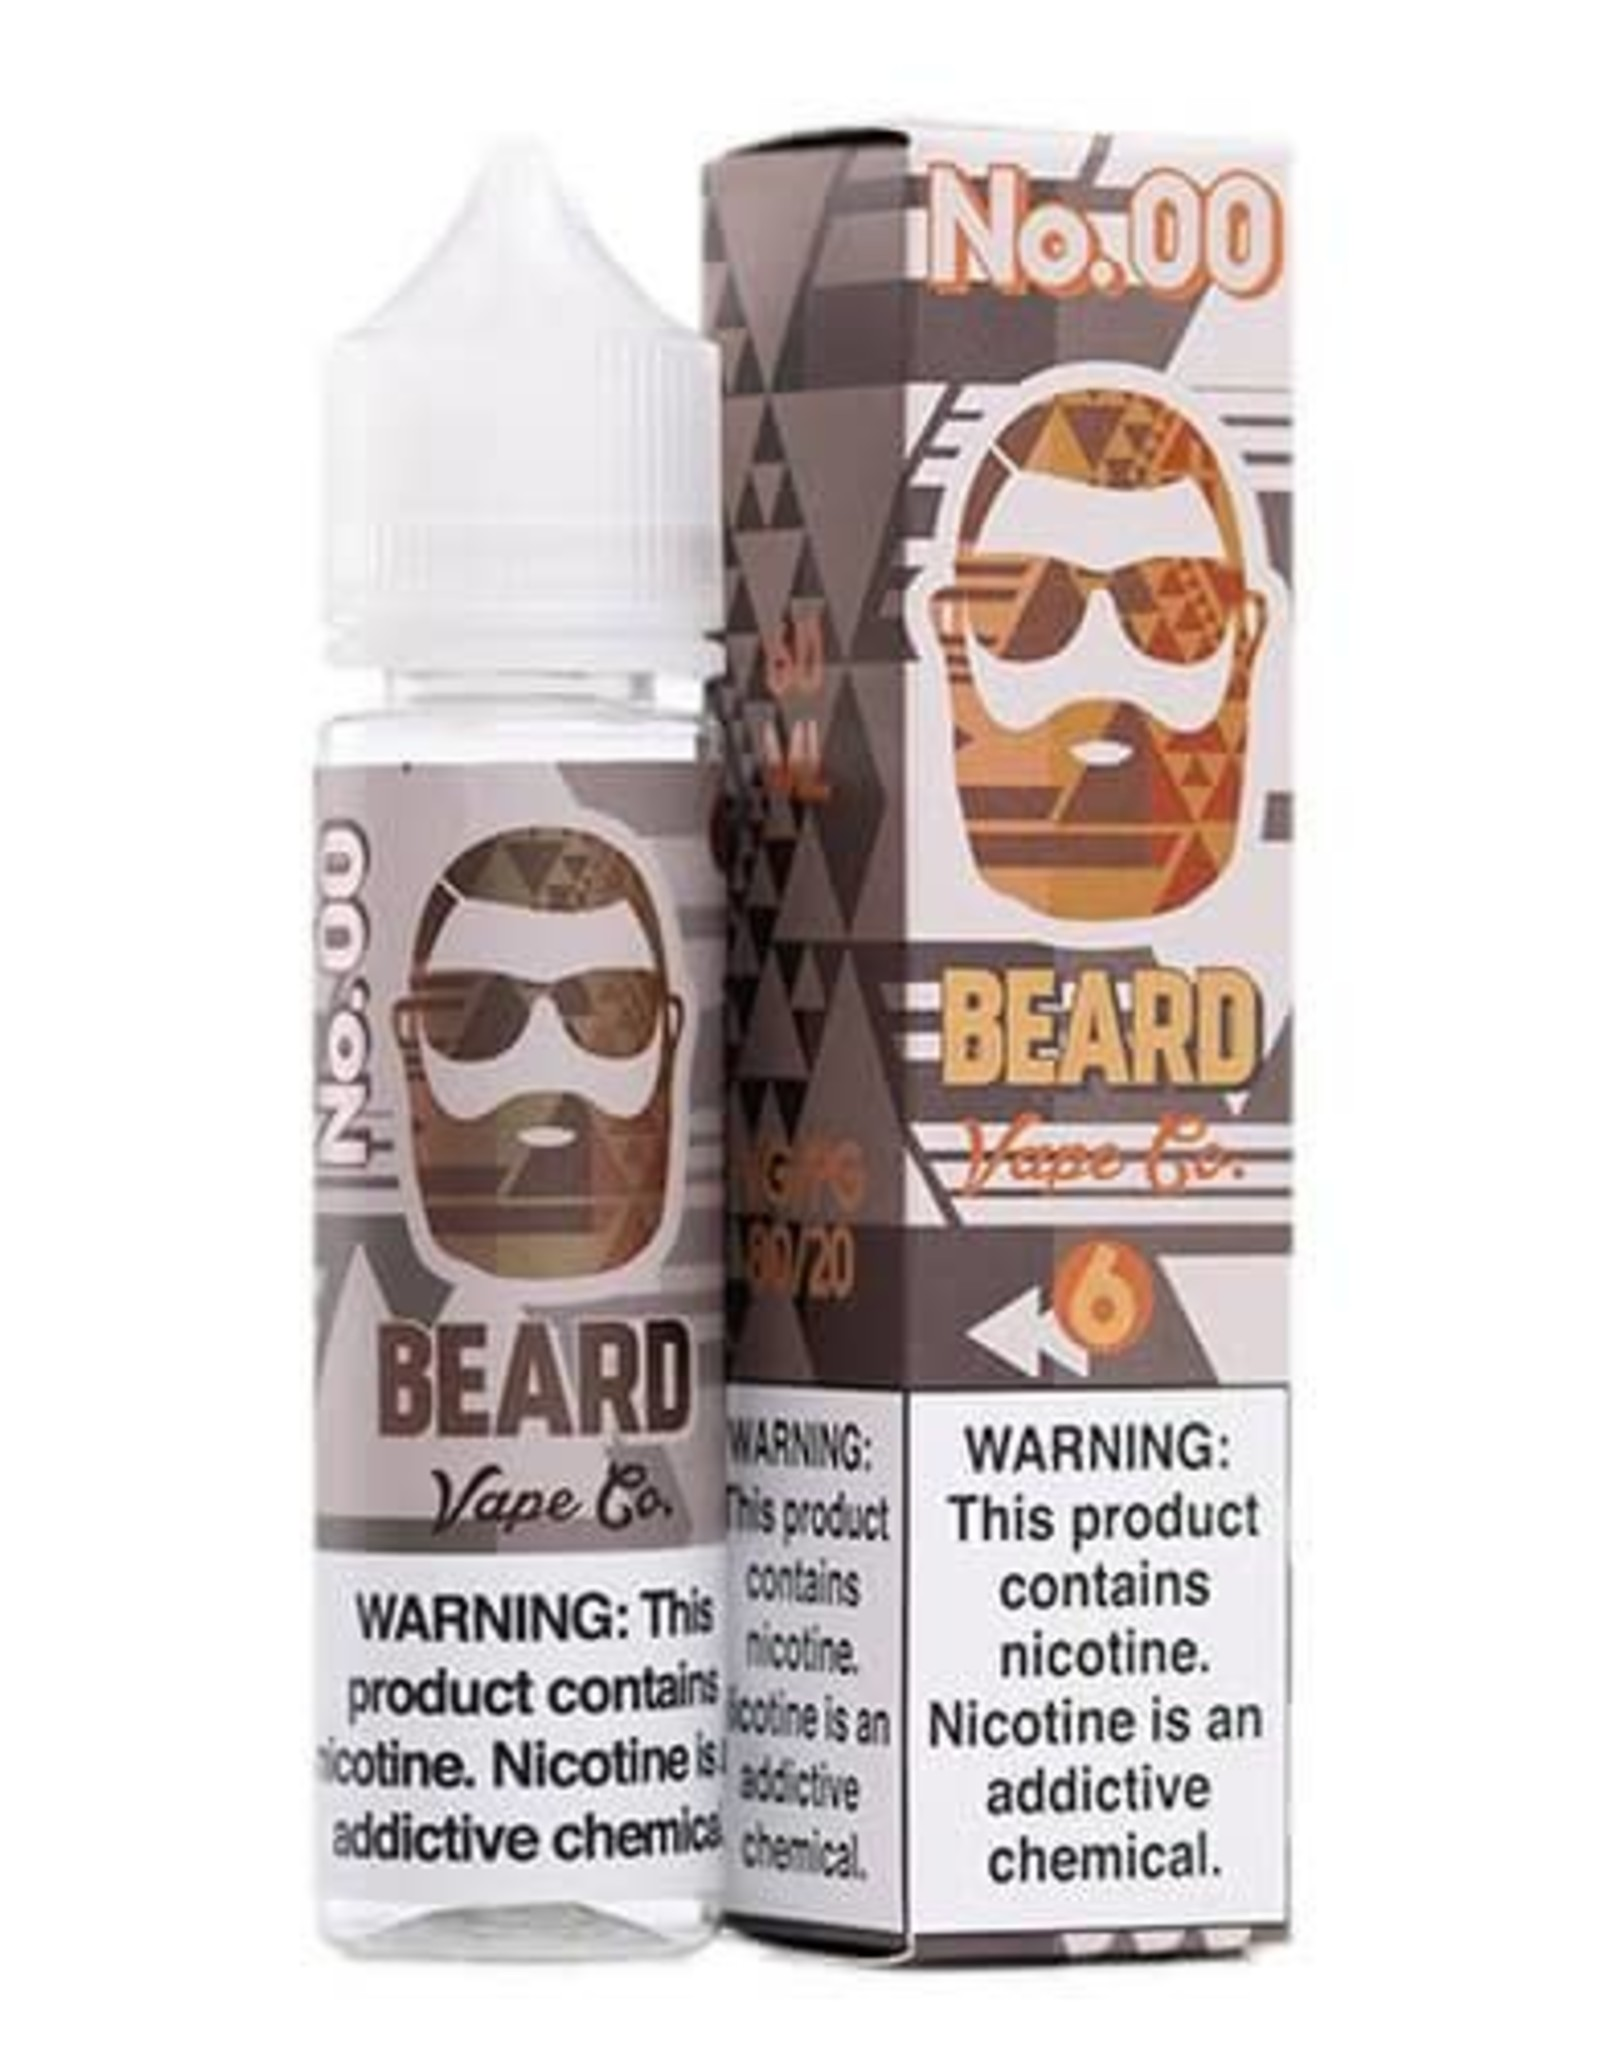 Beard Beard - No. 00 60ml